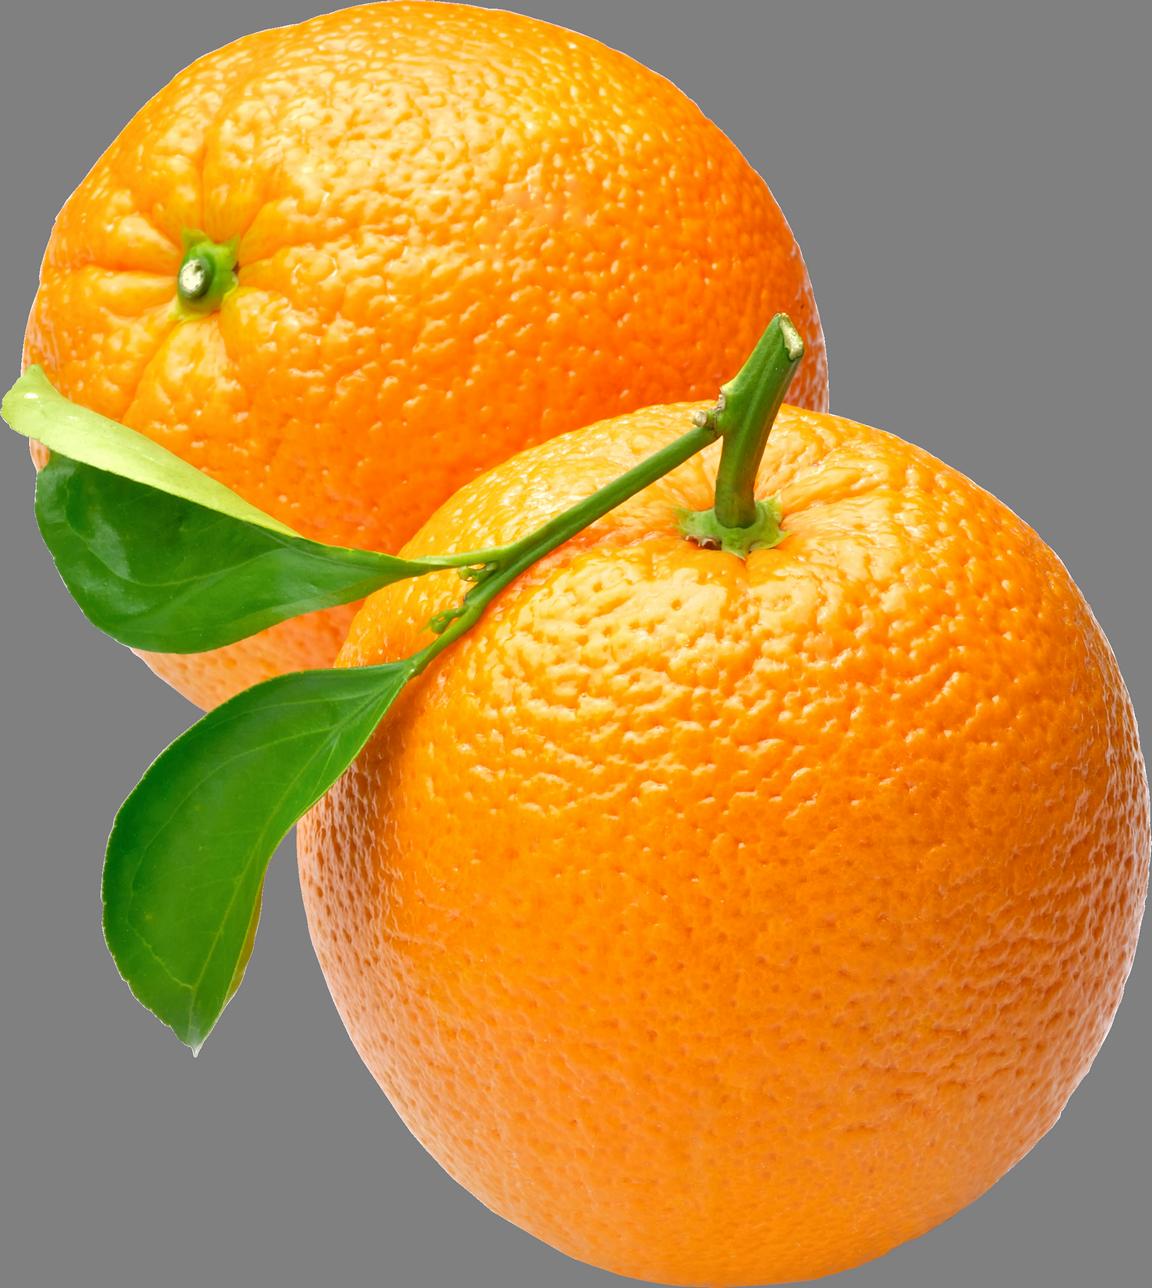 Orange   Oranges PNG Image